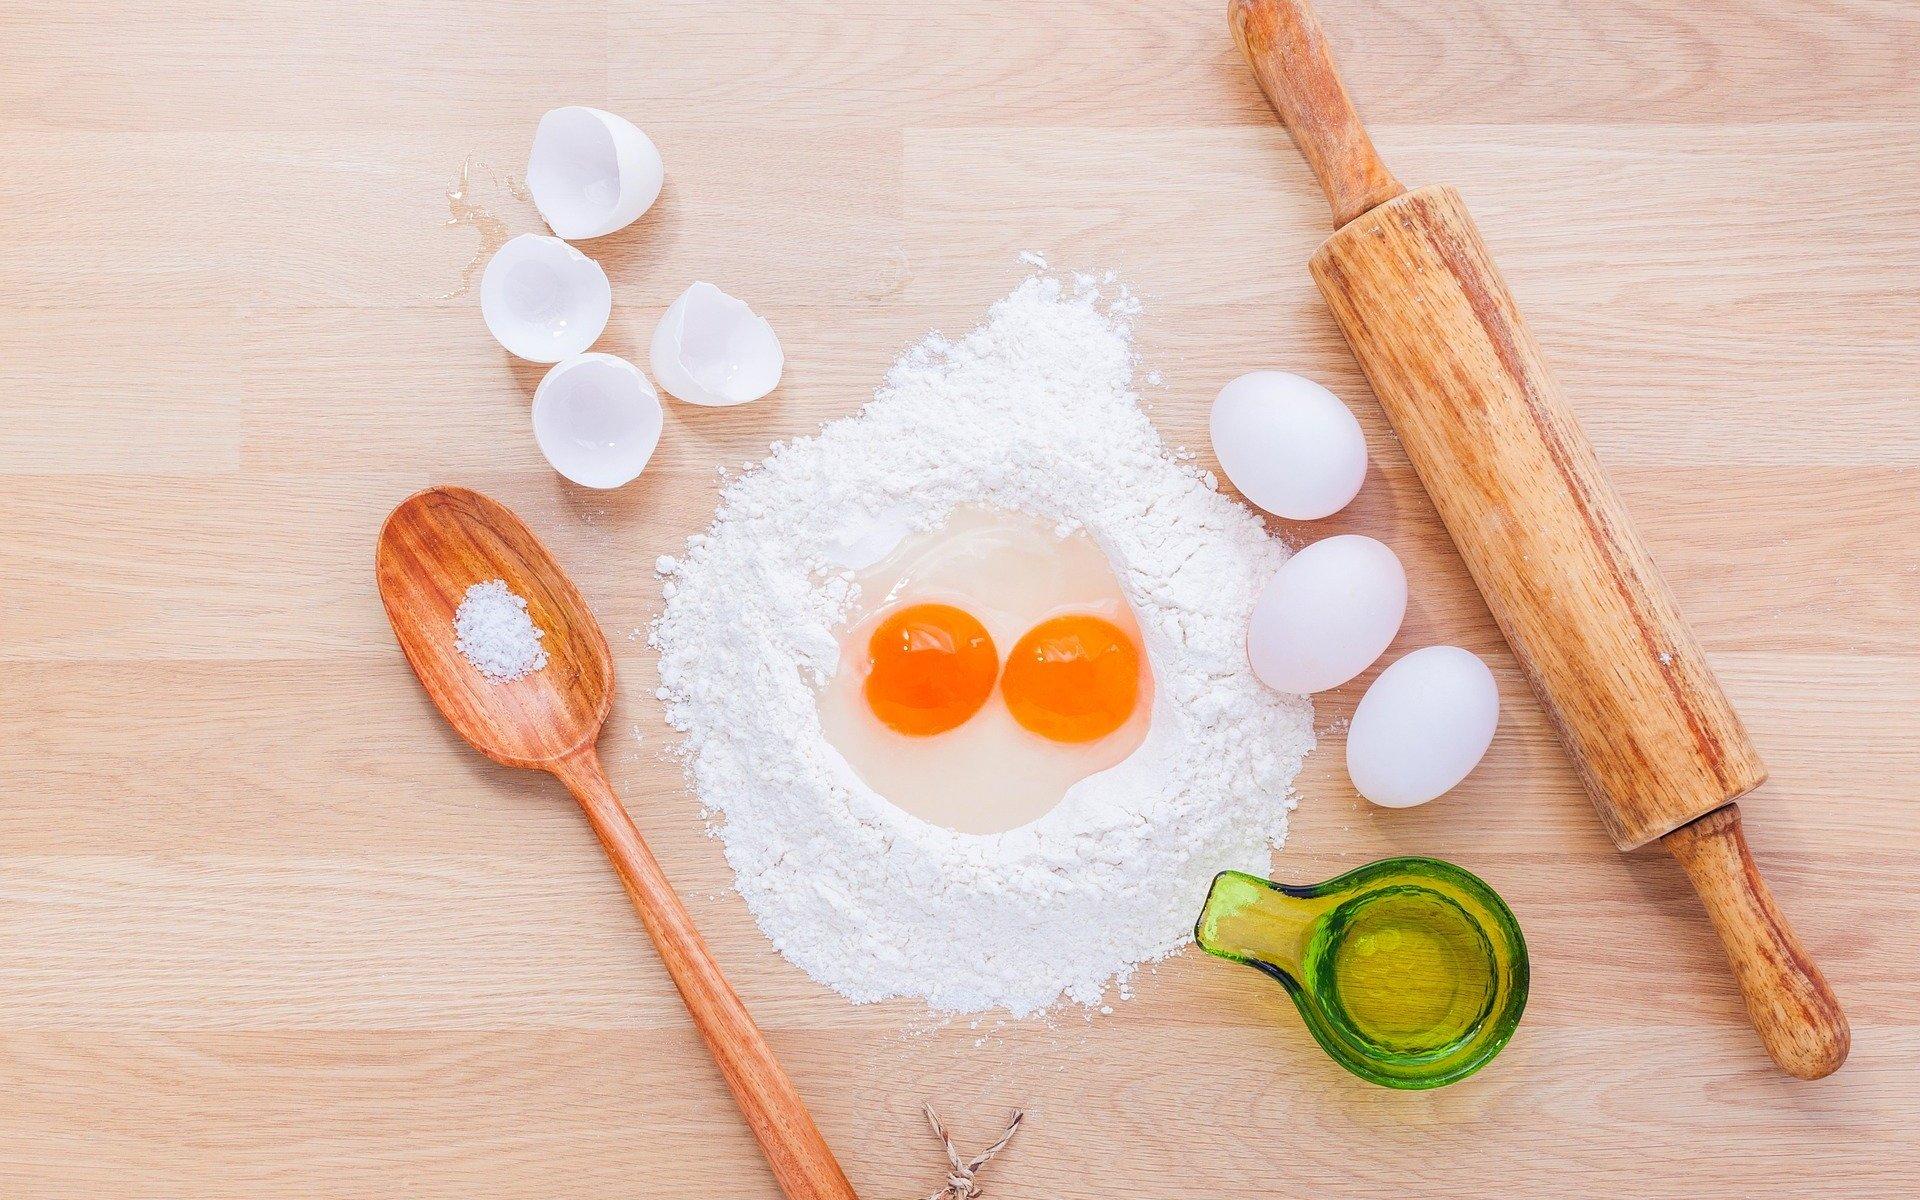 Atelier culinaire L'Aerocook